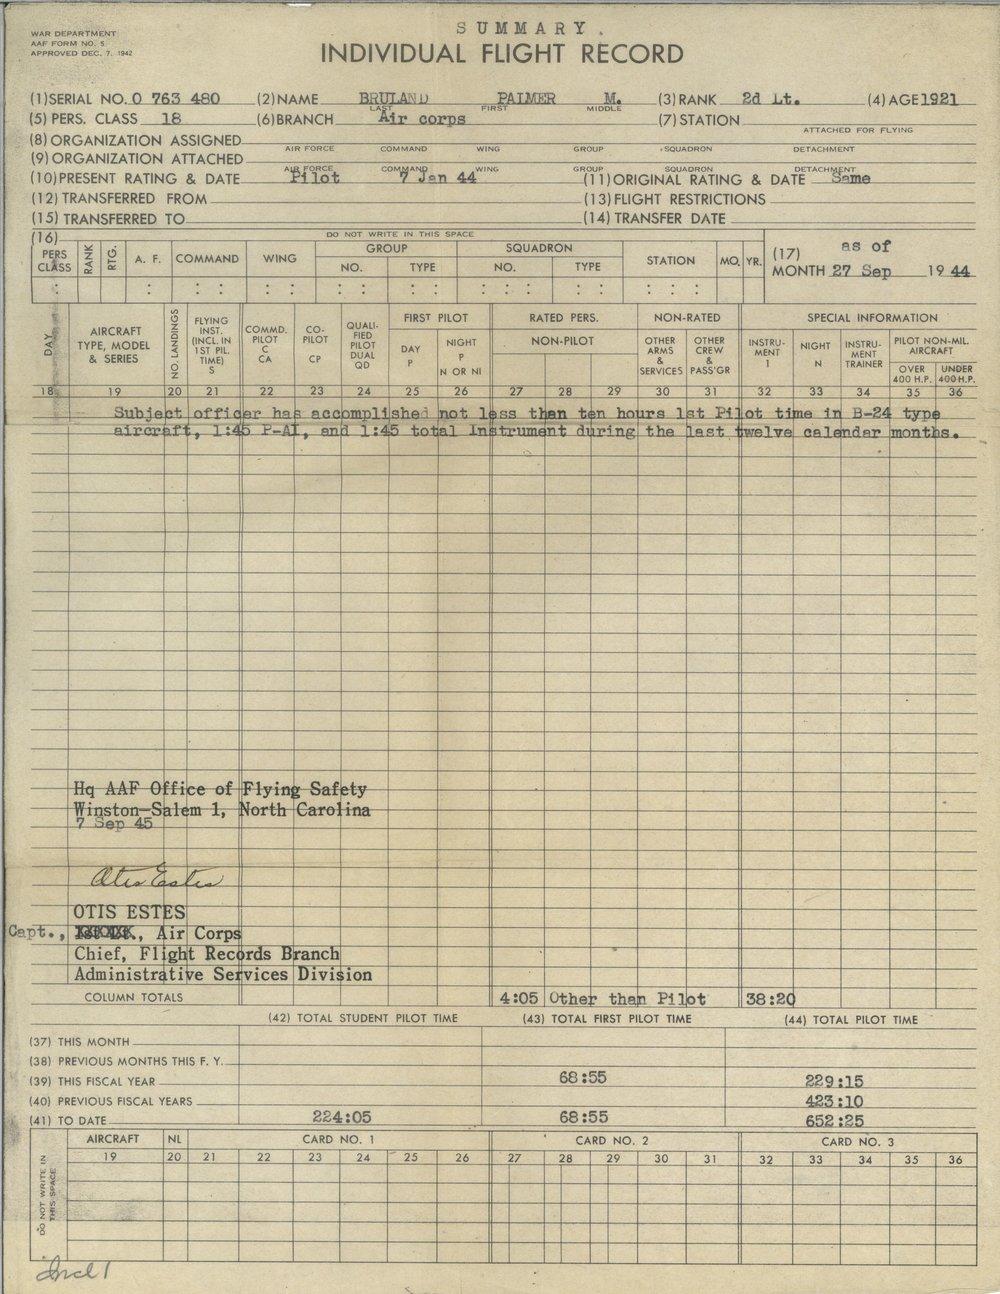 Bruland - pilot's individual flight summary